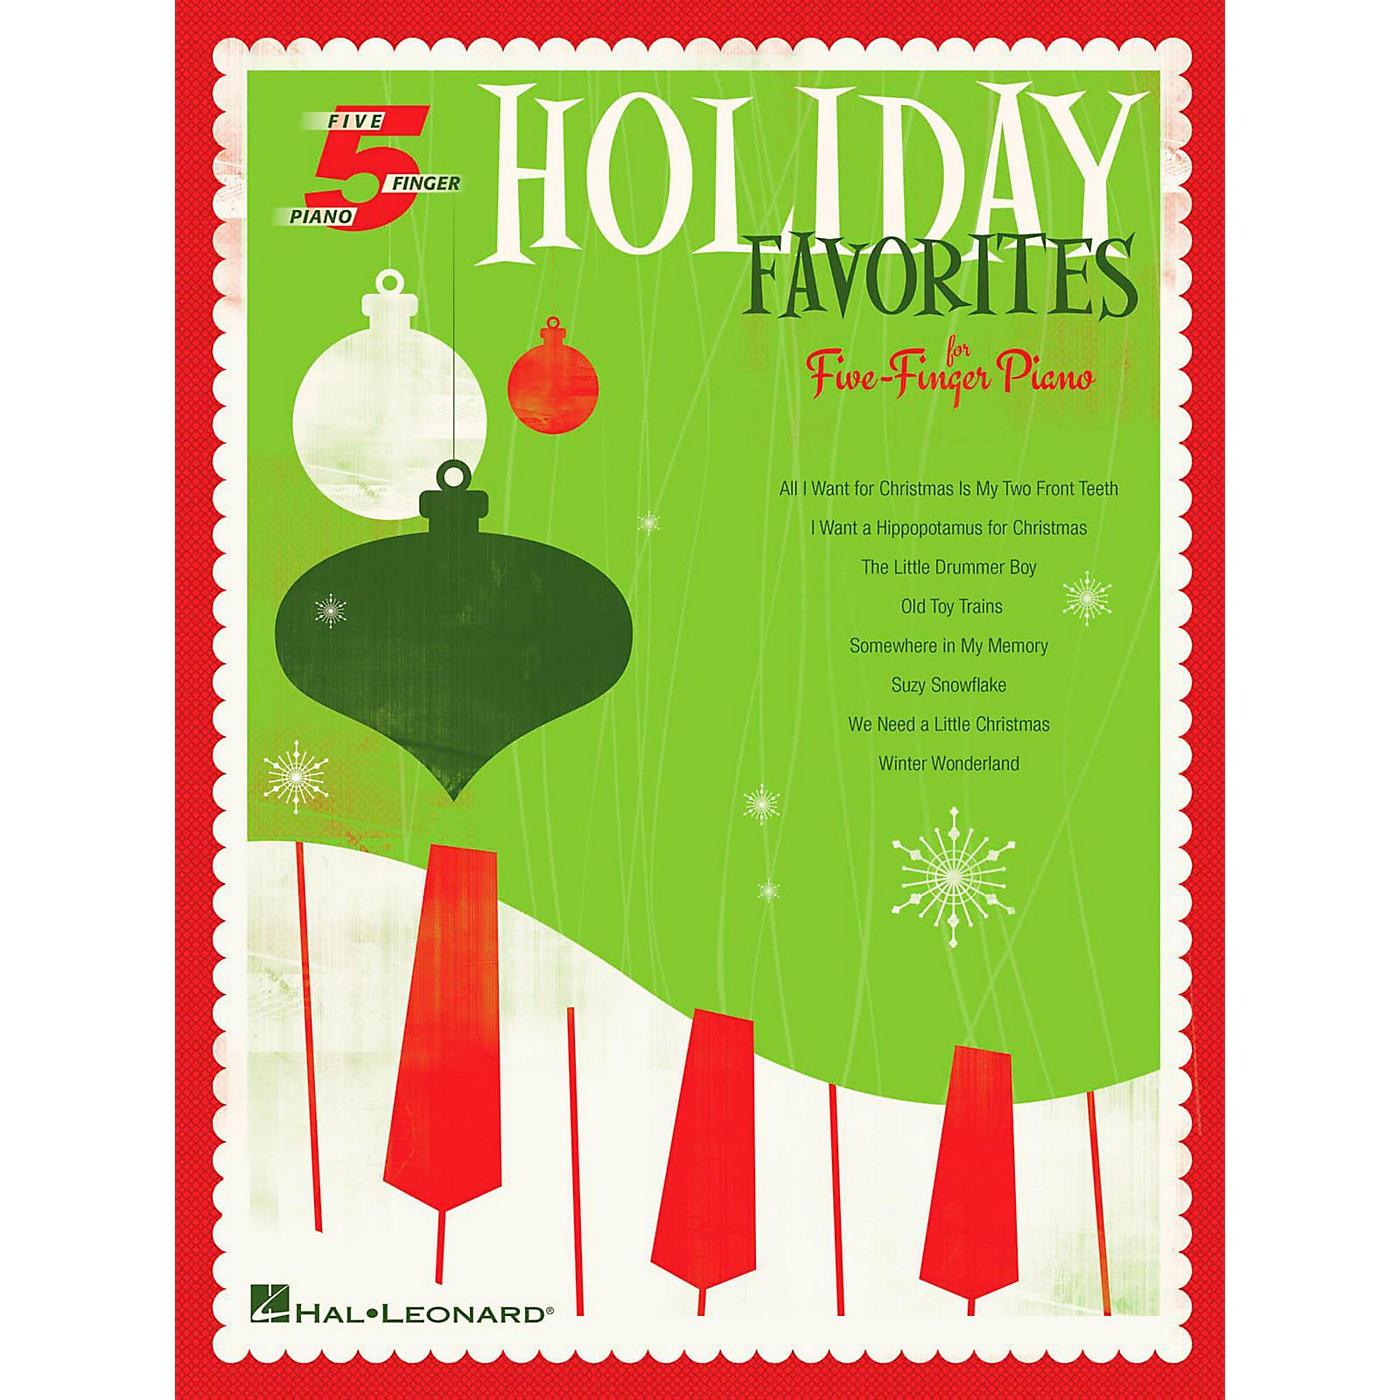 Hal Leonard Holiday Favorites For Five-Finger Piano thumbnail